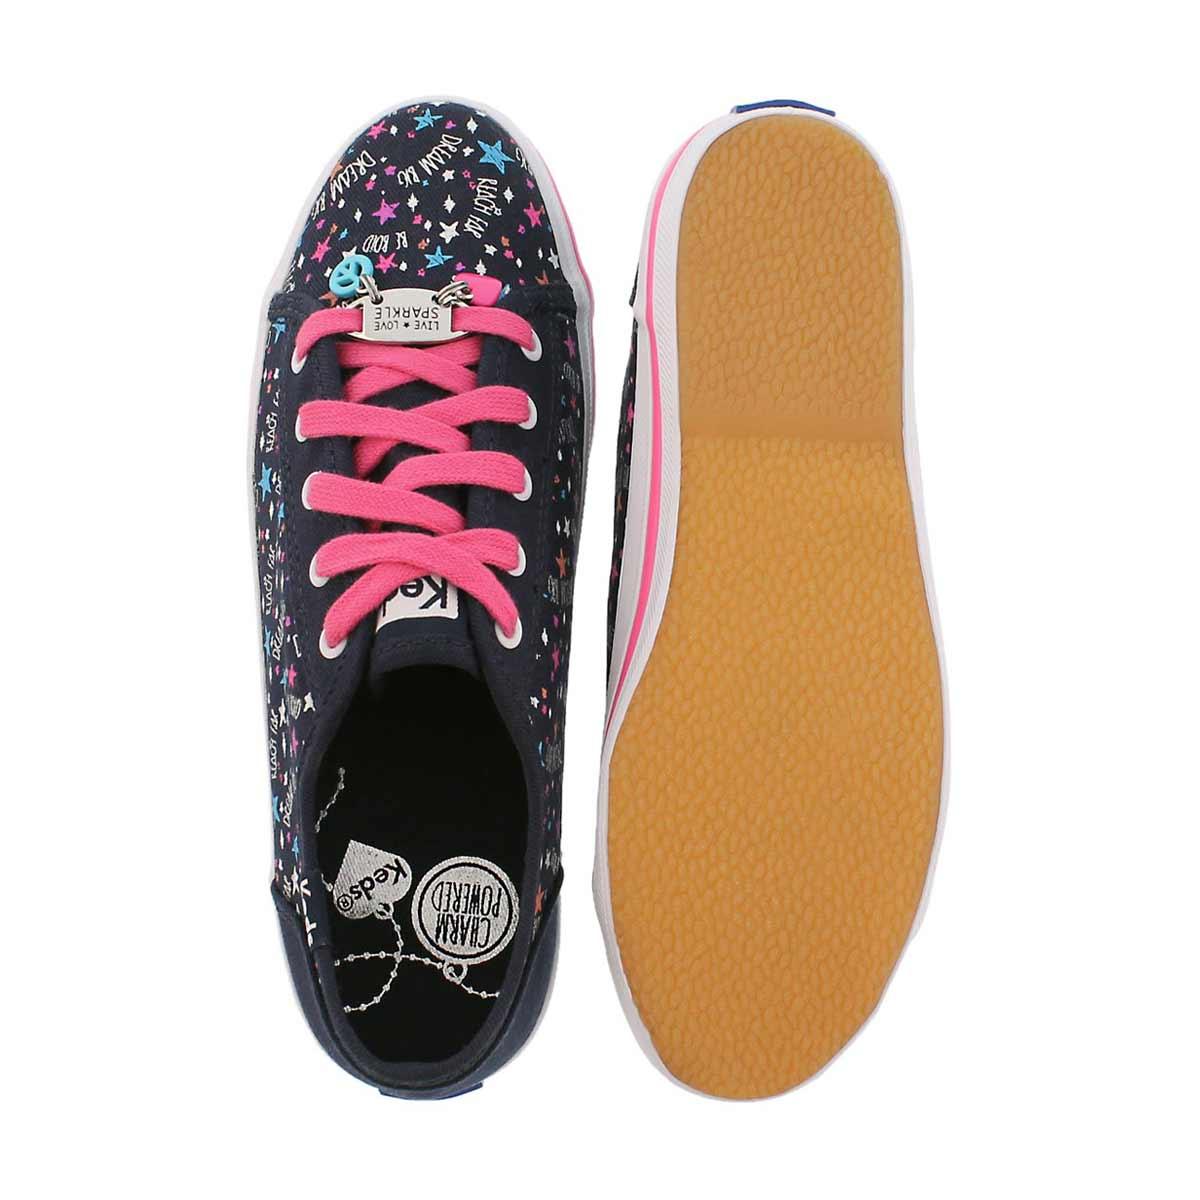 Grls Kickstart Charm nvy/pnk sneaker